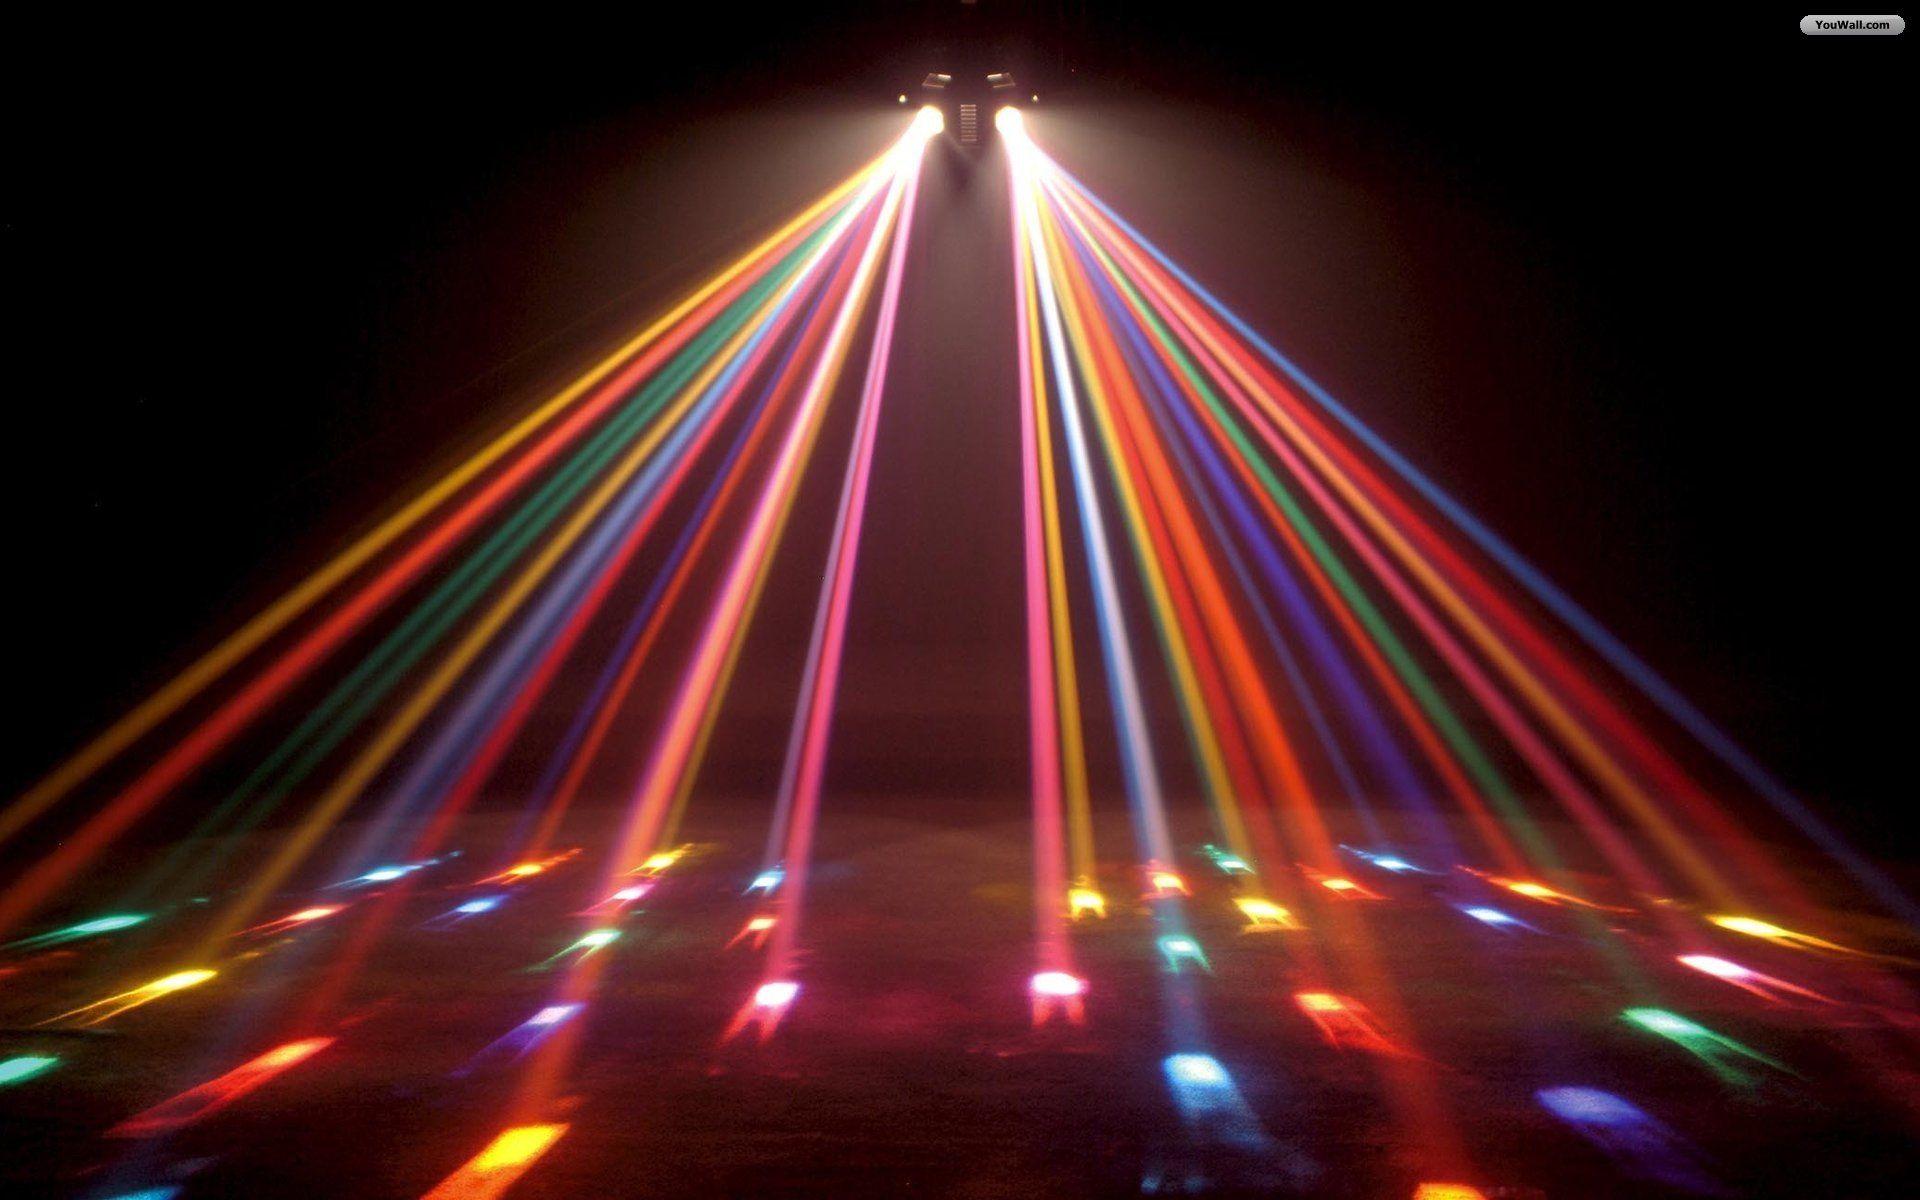 disco   YouWall - Disco Lights Wallpaper - wallpaper,wallpapers ... for Led Lighting Wallpaper  555kxo